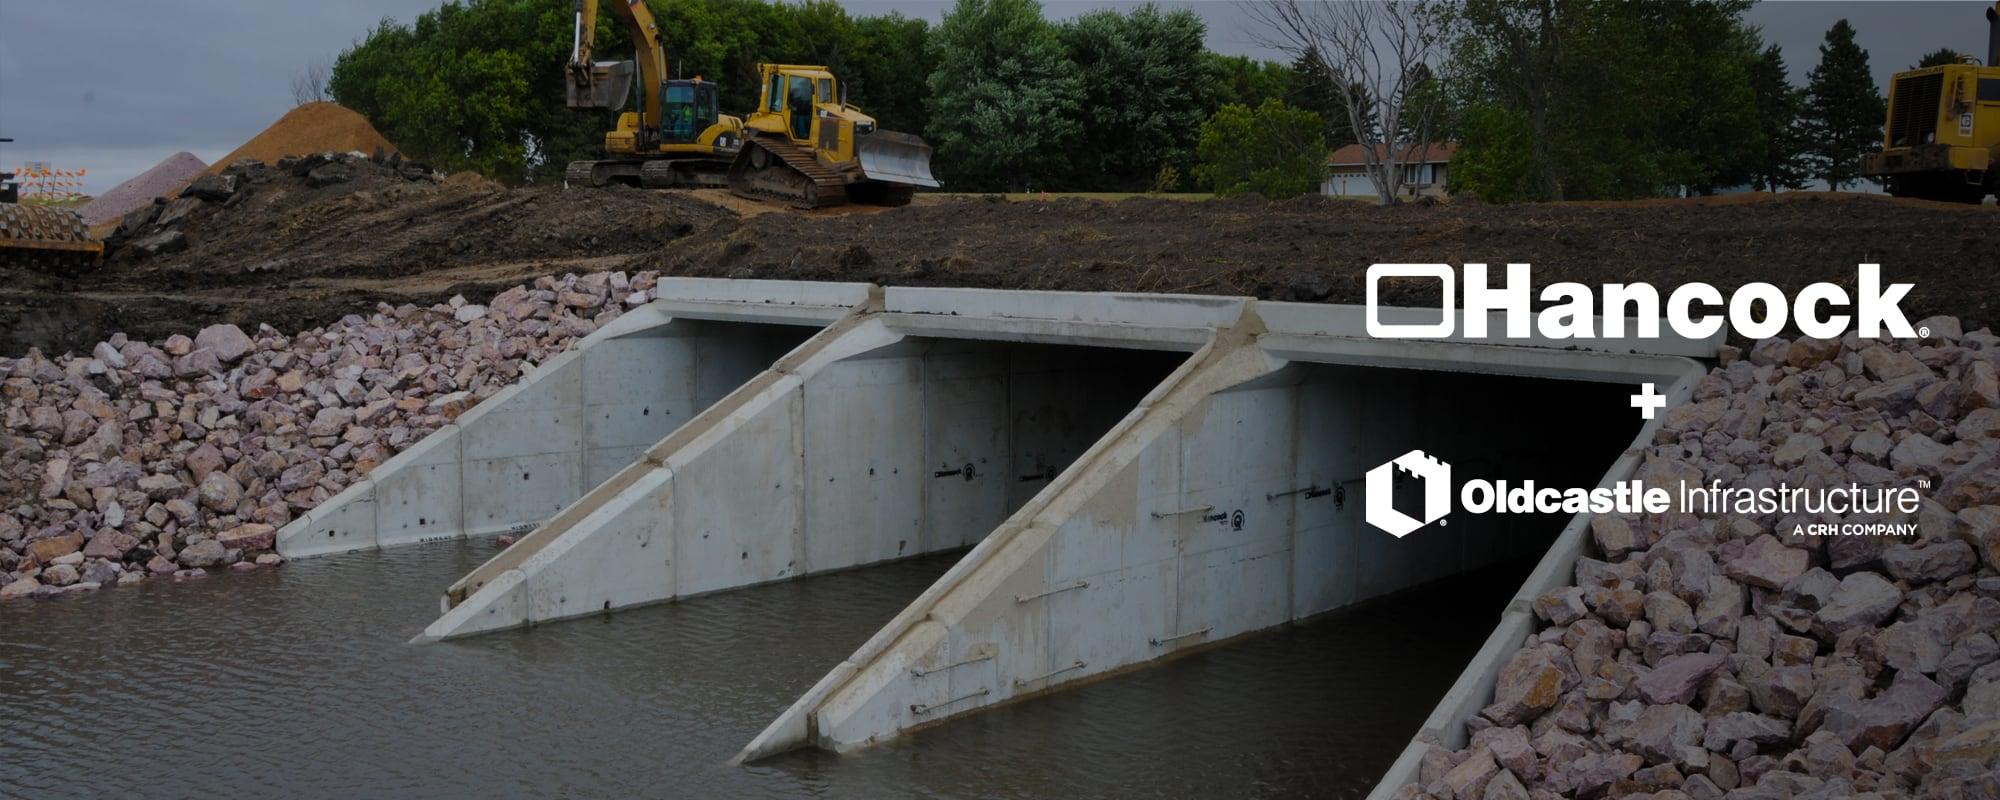 Hancock + Oldcastle Infrastructure